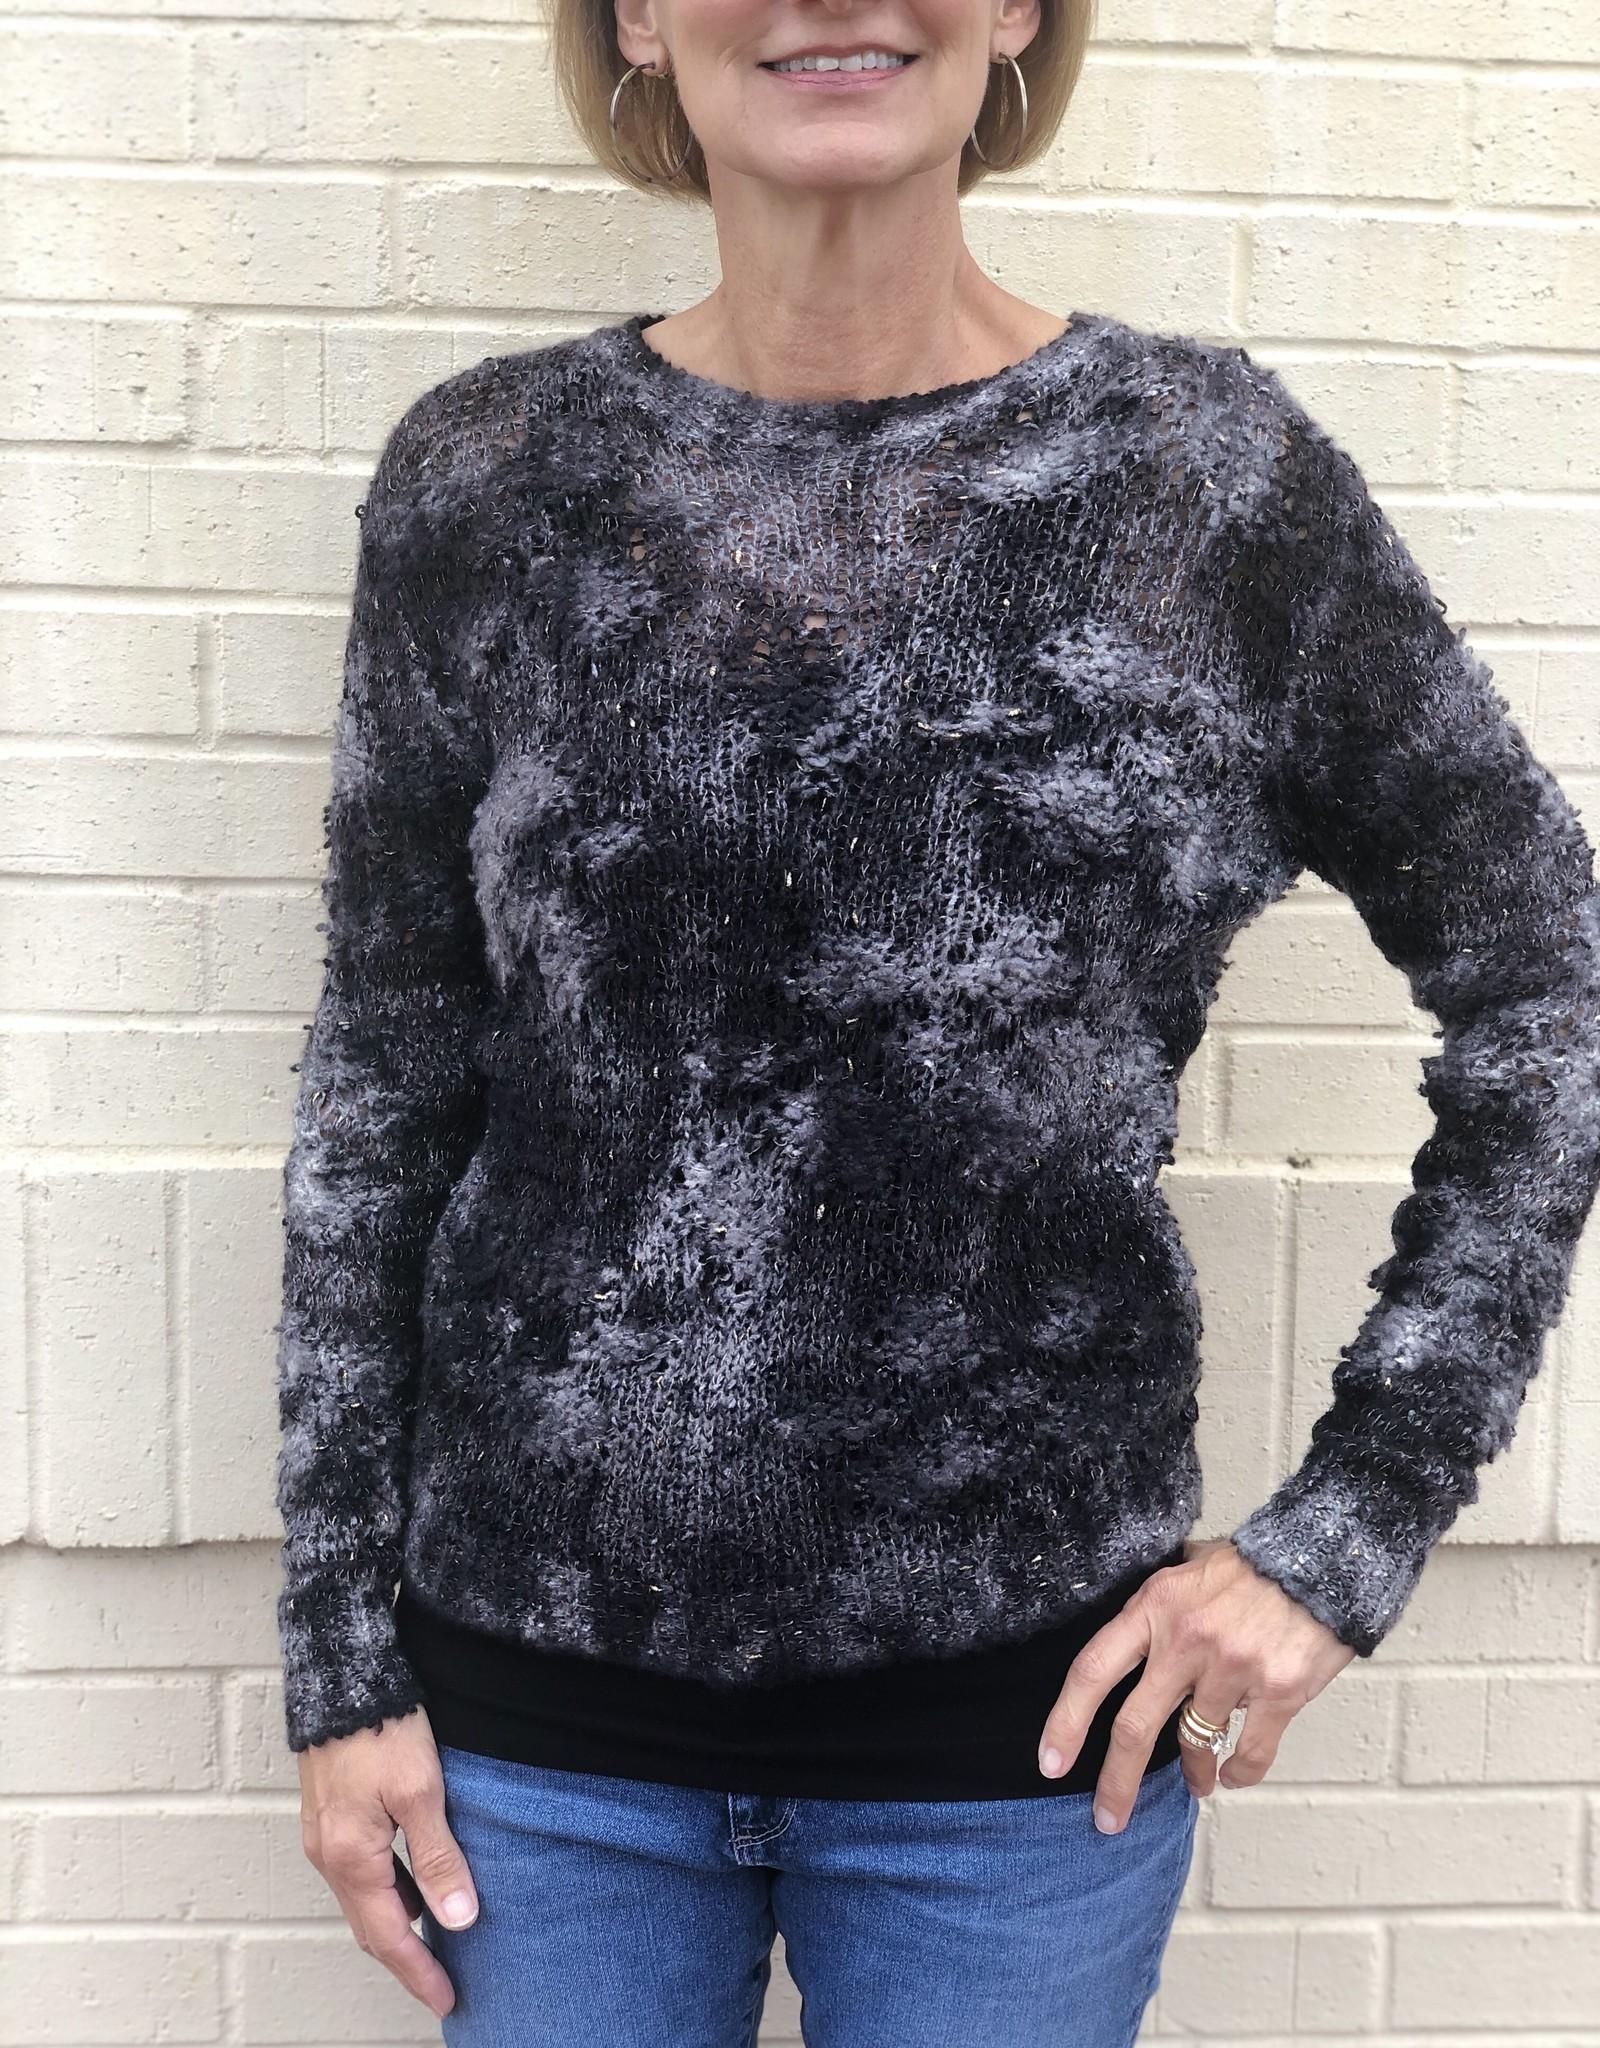 AVANT TOI - Knit Sweater